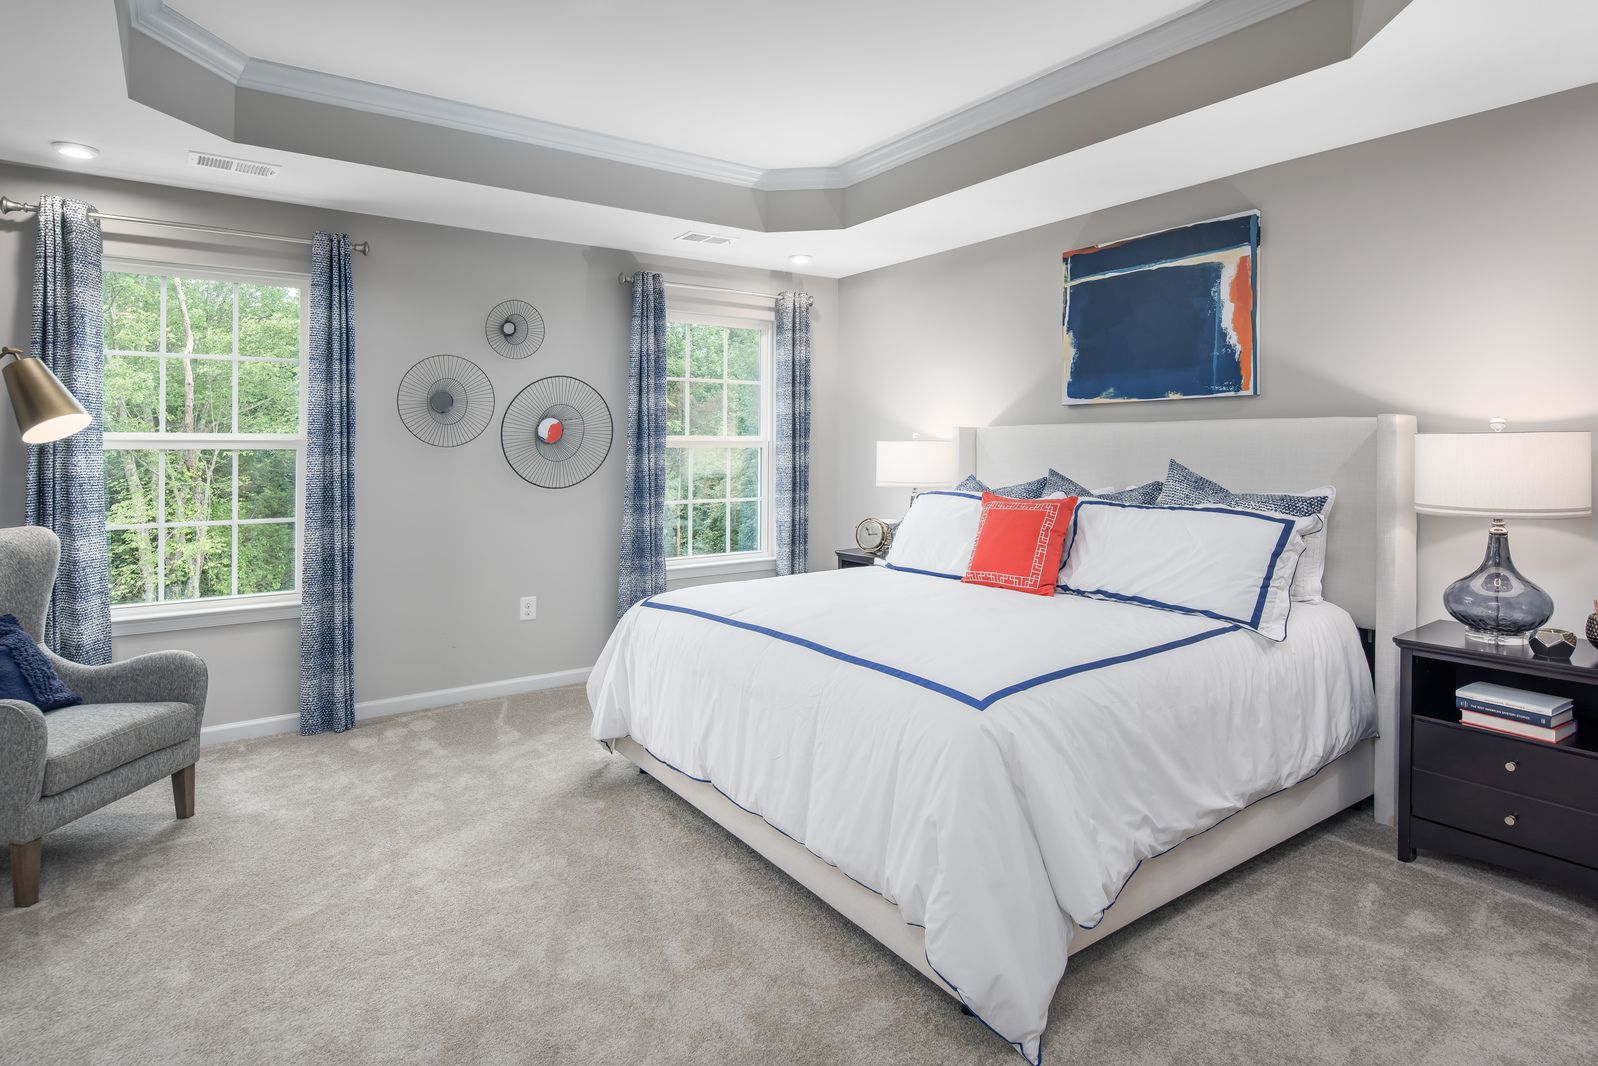 Bedroom featured in the Schubert By Ryan Homes in Washington, VA